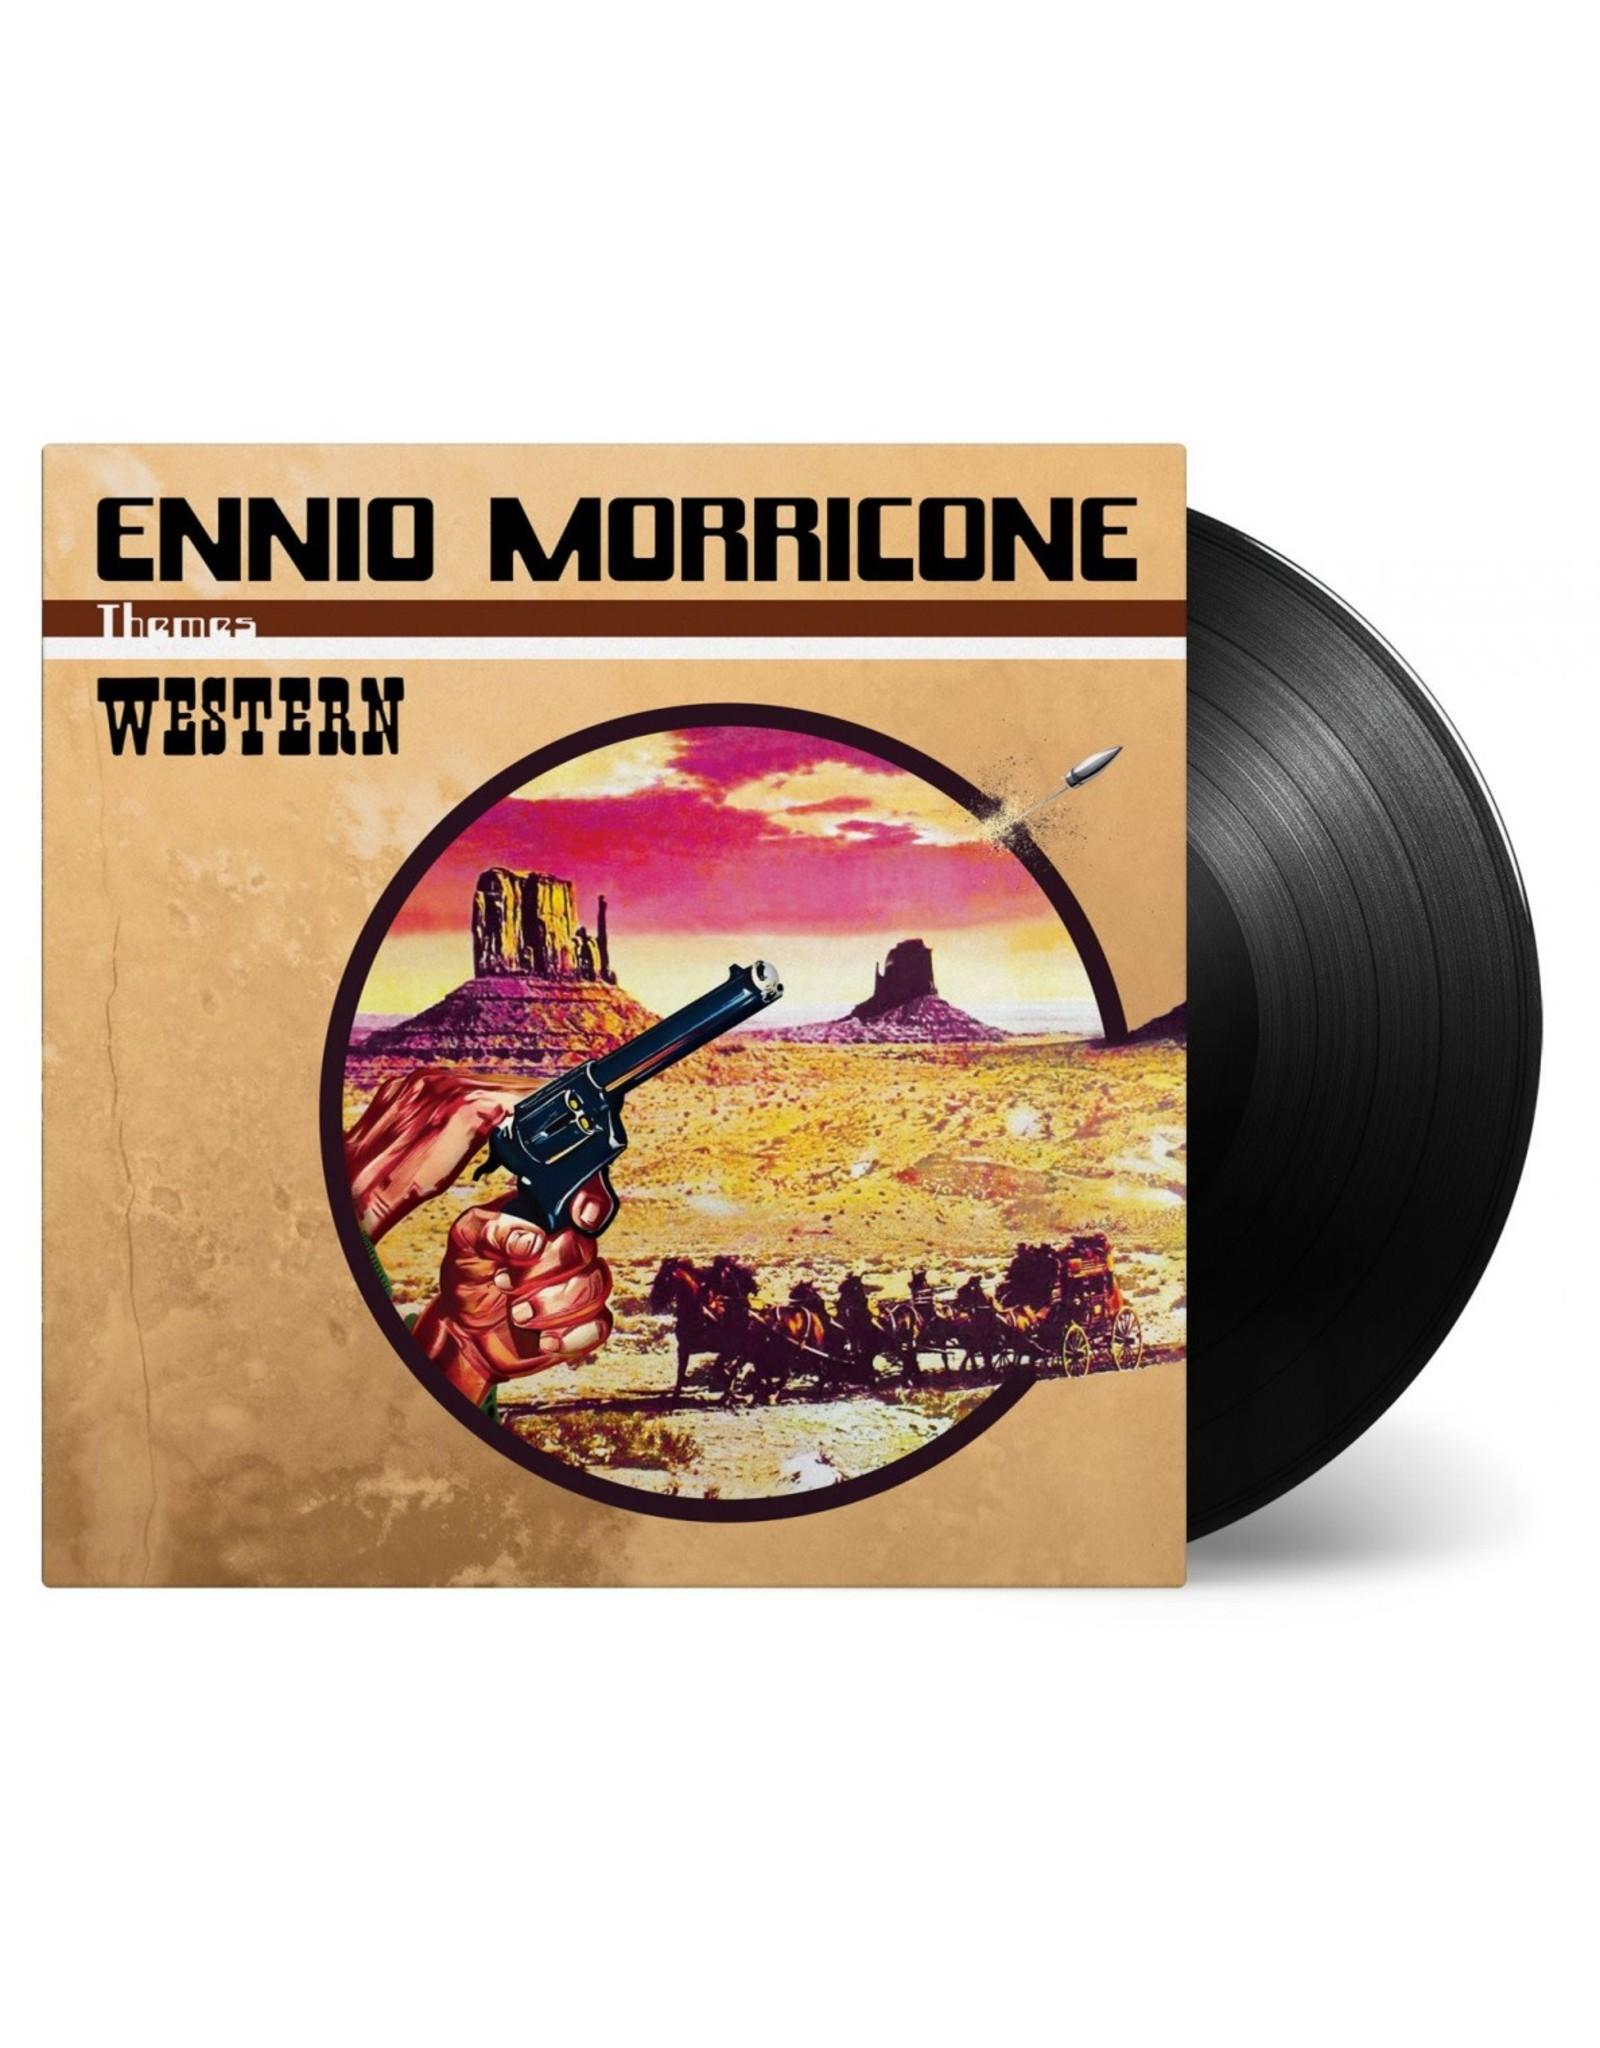 Ennio Morricone - Western (Music On Vinyl)